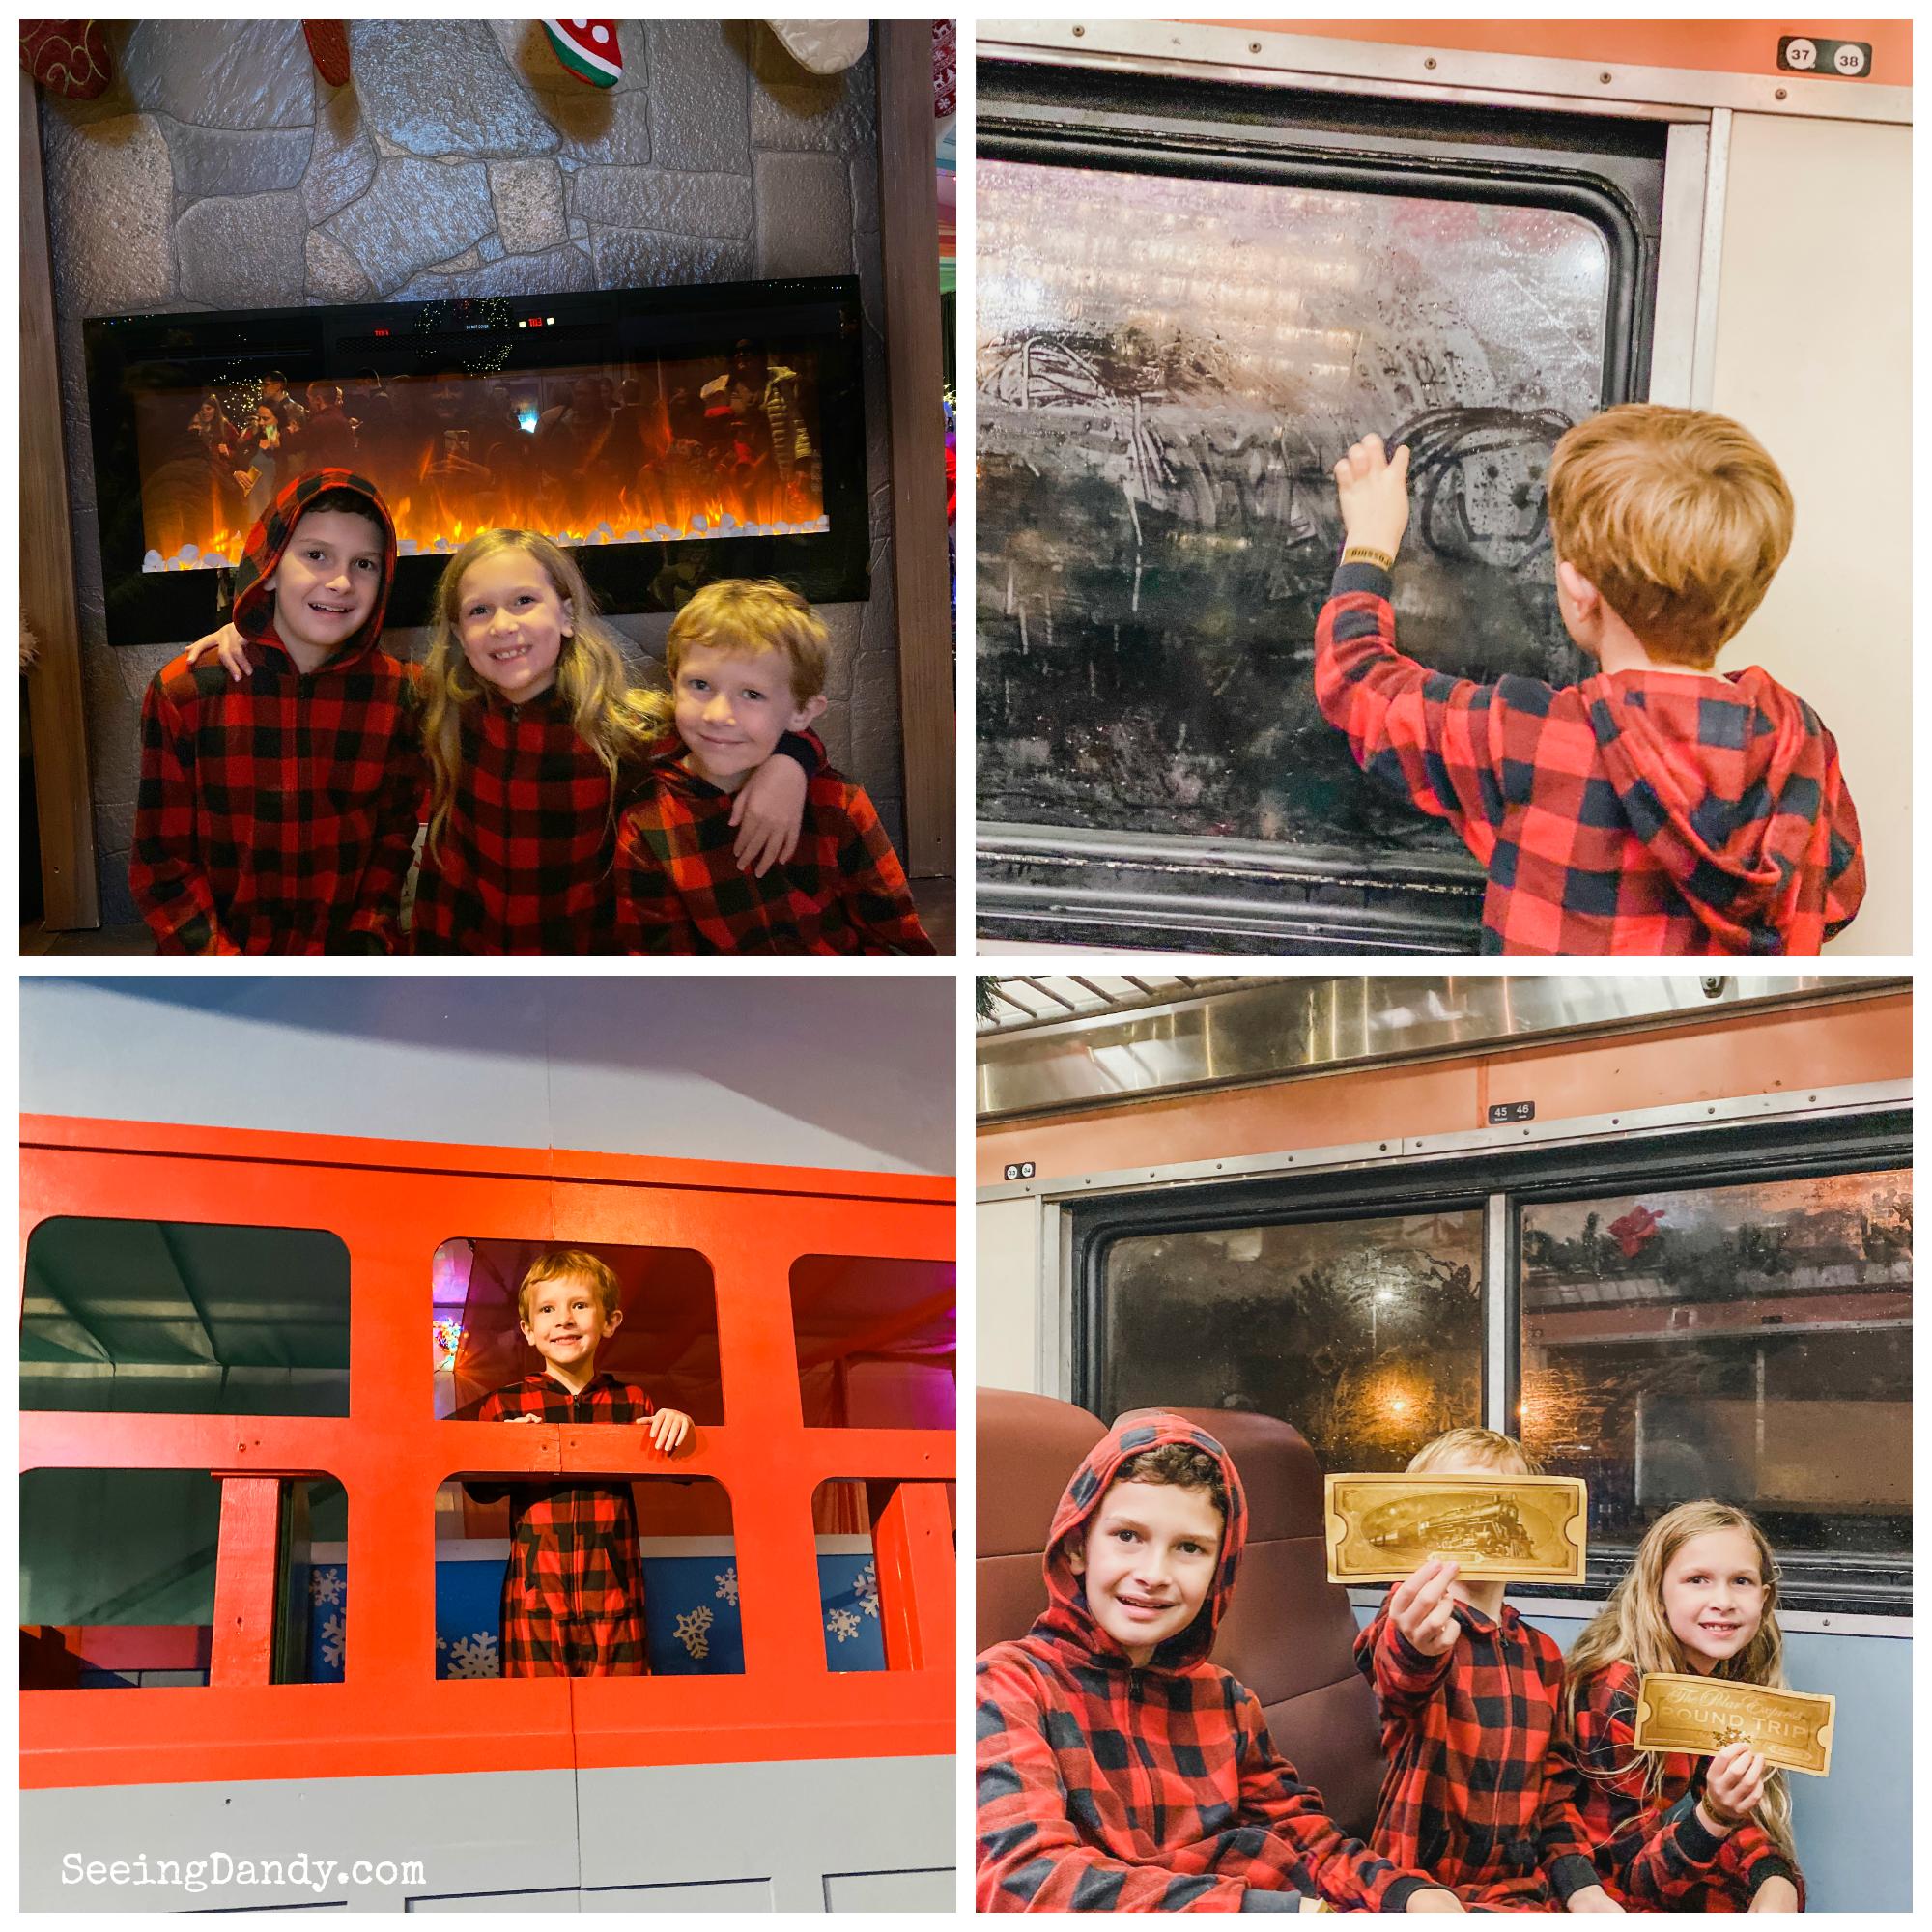 St. Louis Polar Express train ride family fun golden tickets